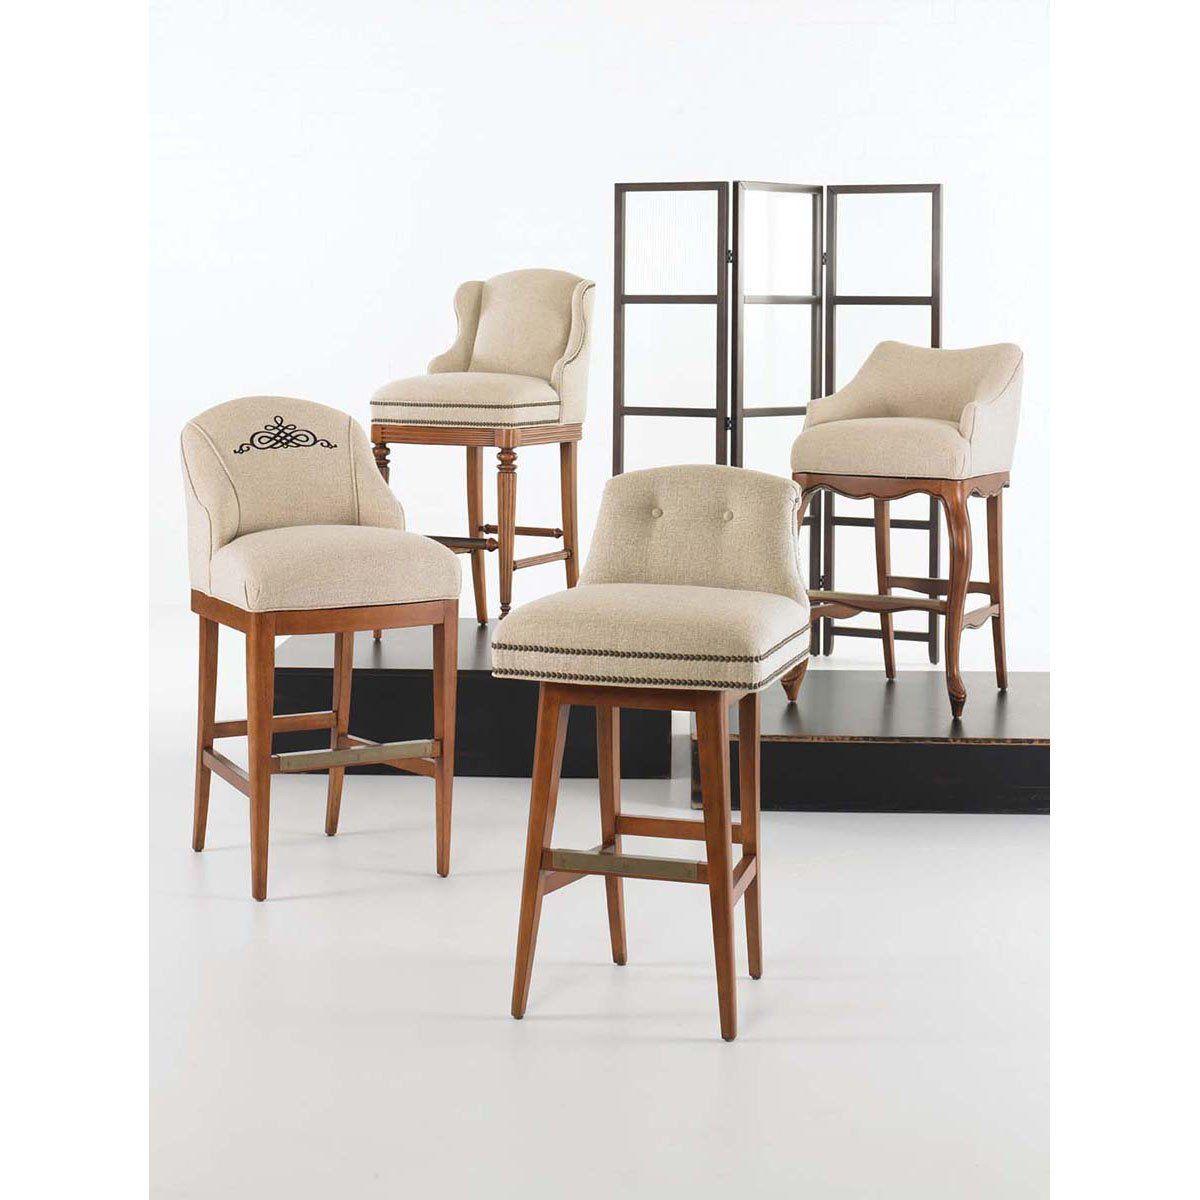 Vanguard Furniture Wing Fabric Bar Stool Furniture Bar Stools Furniture Upholstery